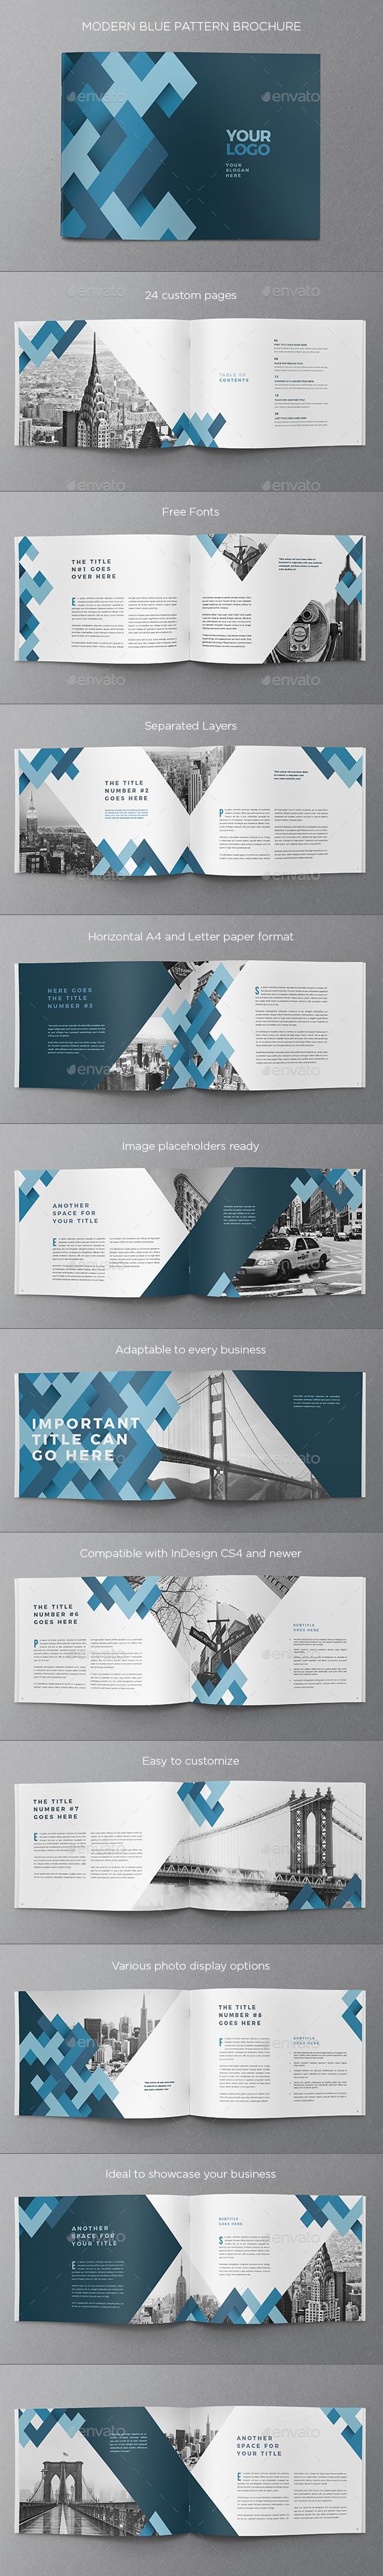 Modern Blue Pattern Brochure - Brochures Print Templates